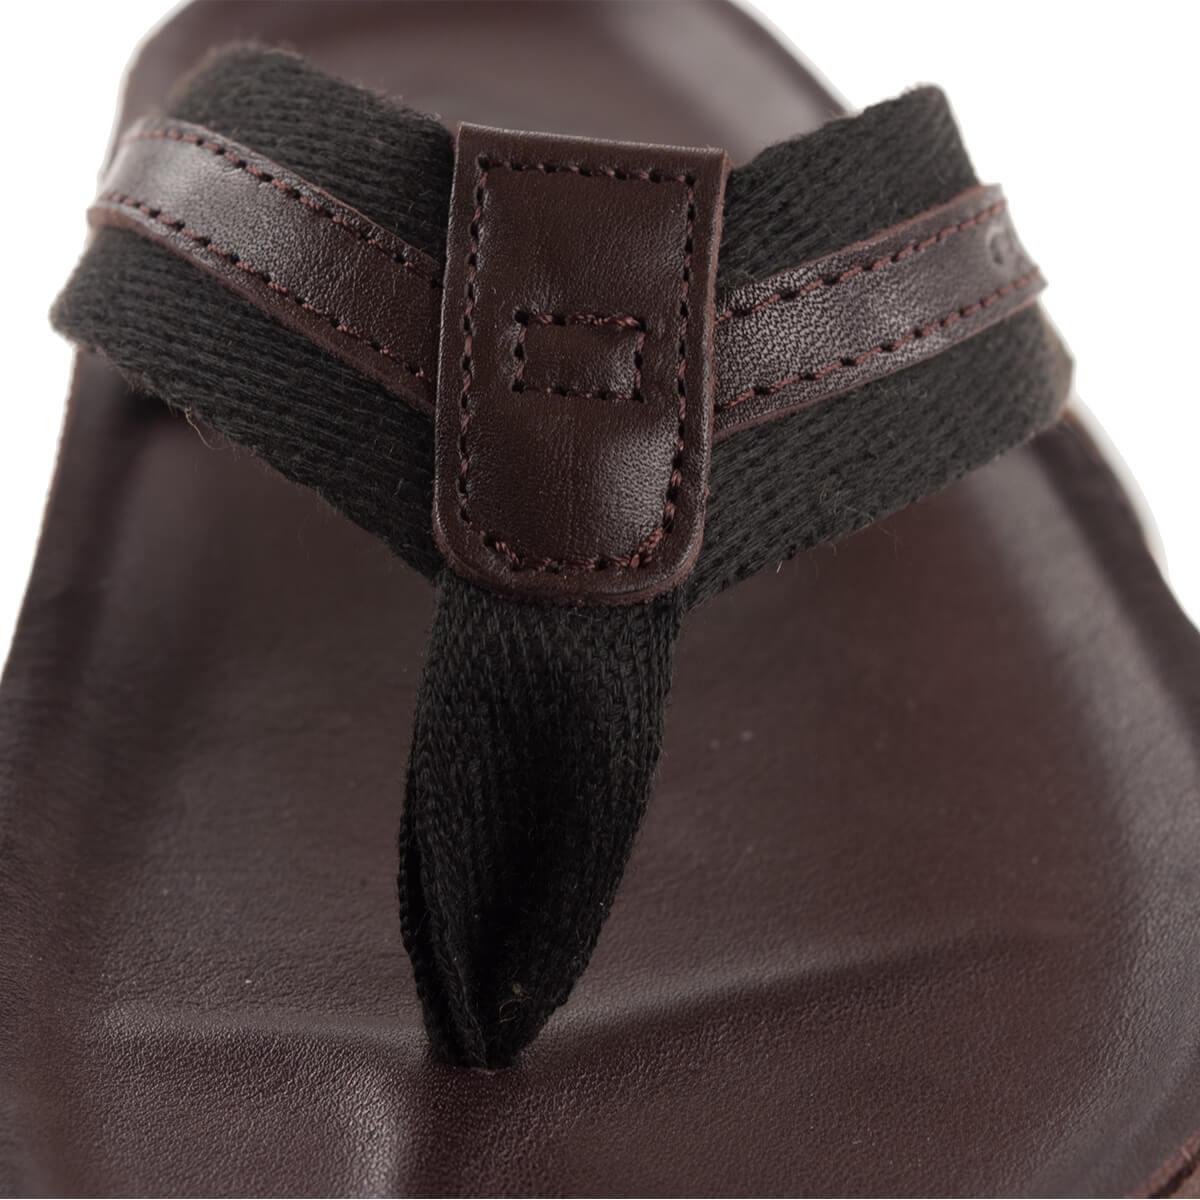 große Auswahl offizielle Fotos größte Auswahl Gant Herren Schuhe Zehentrenner Breeze Leder